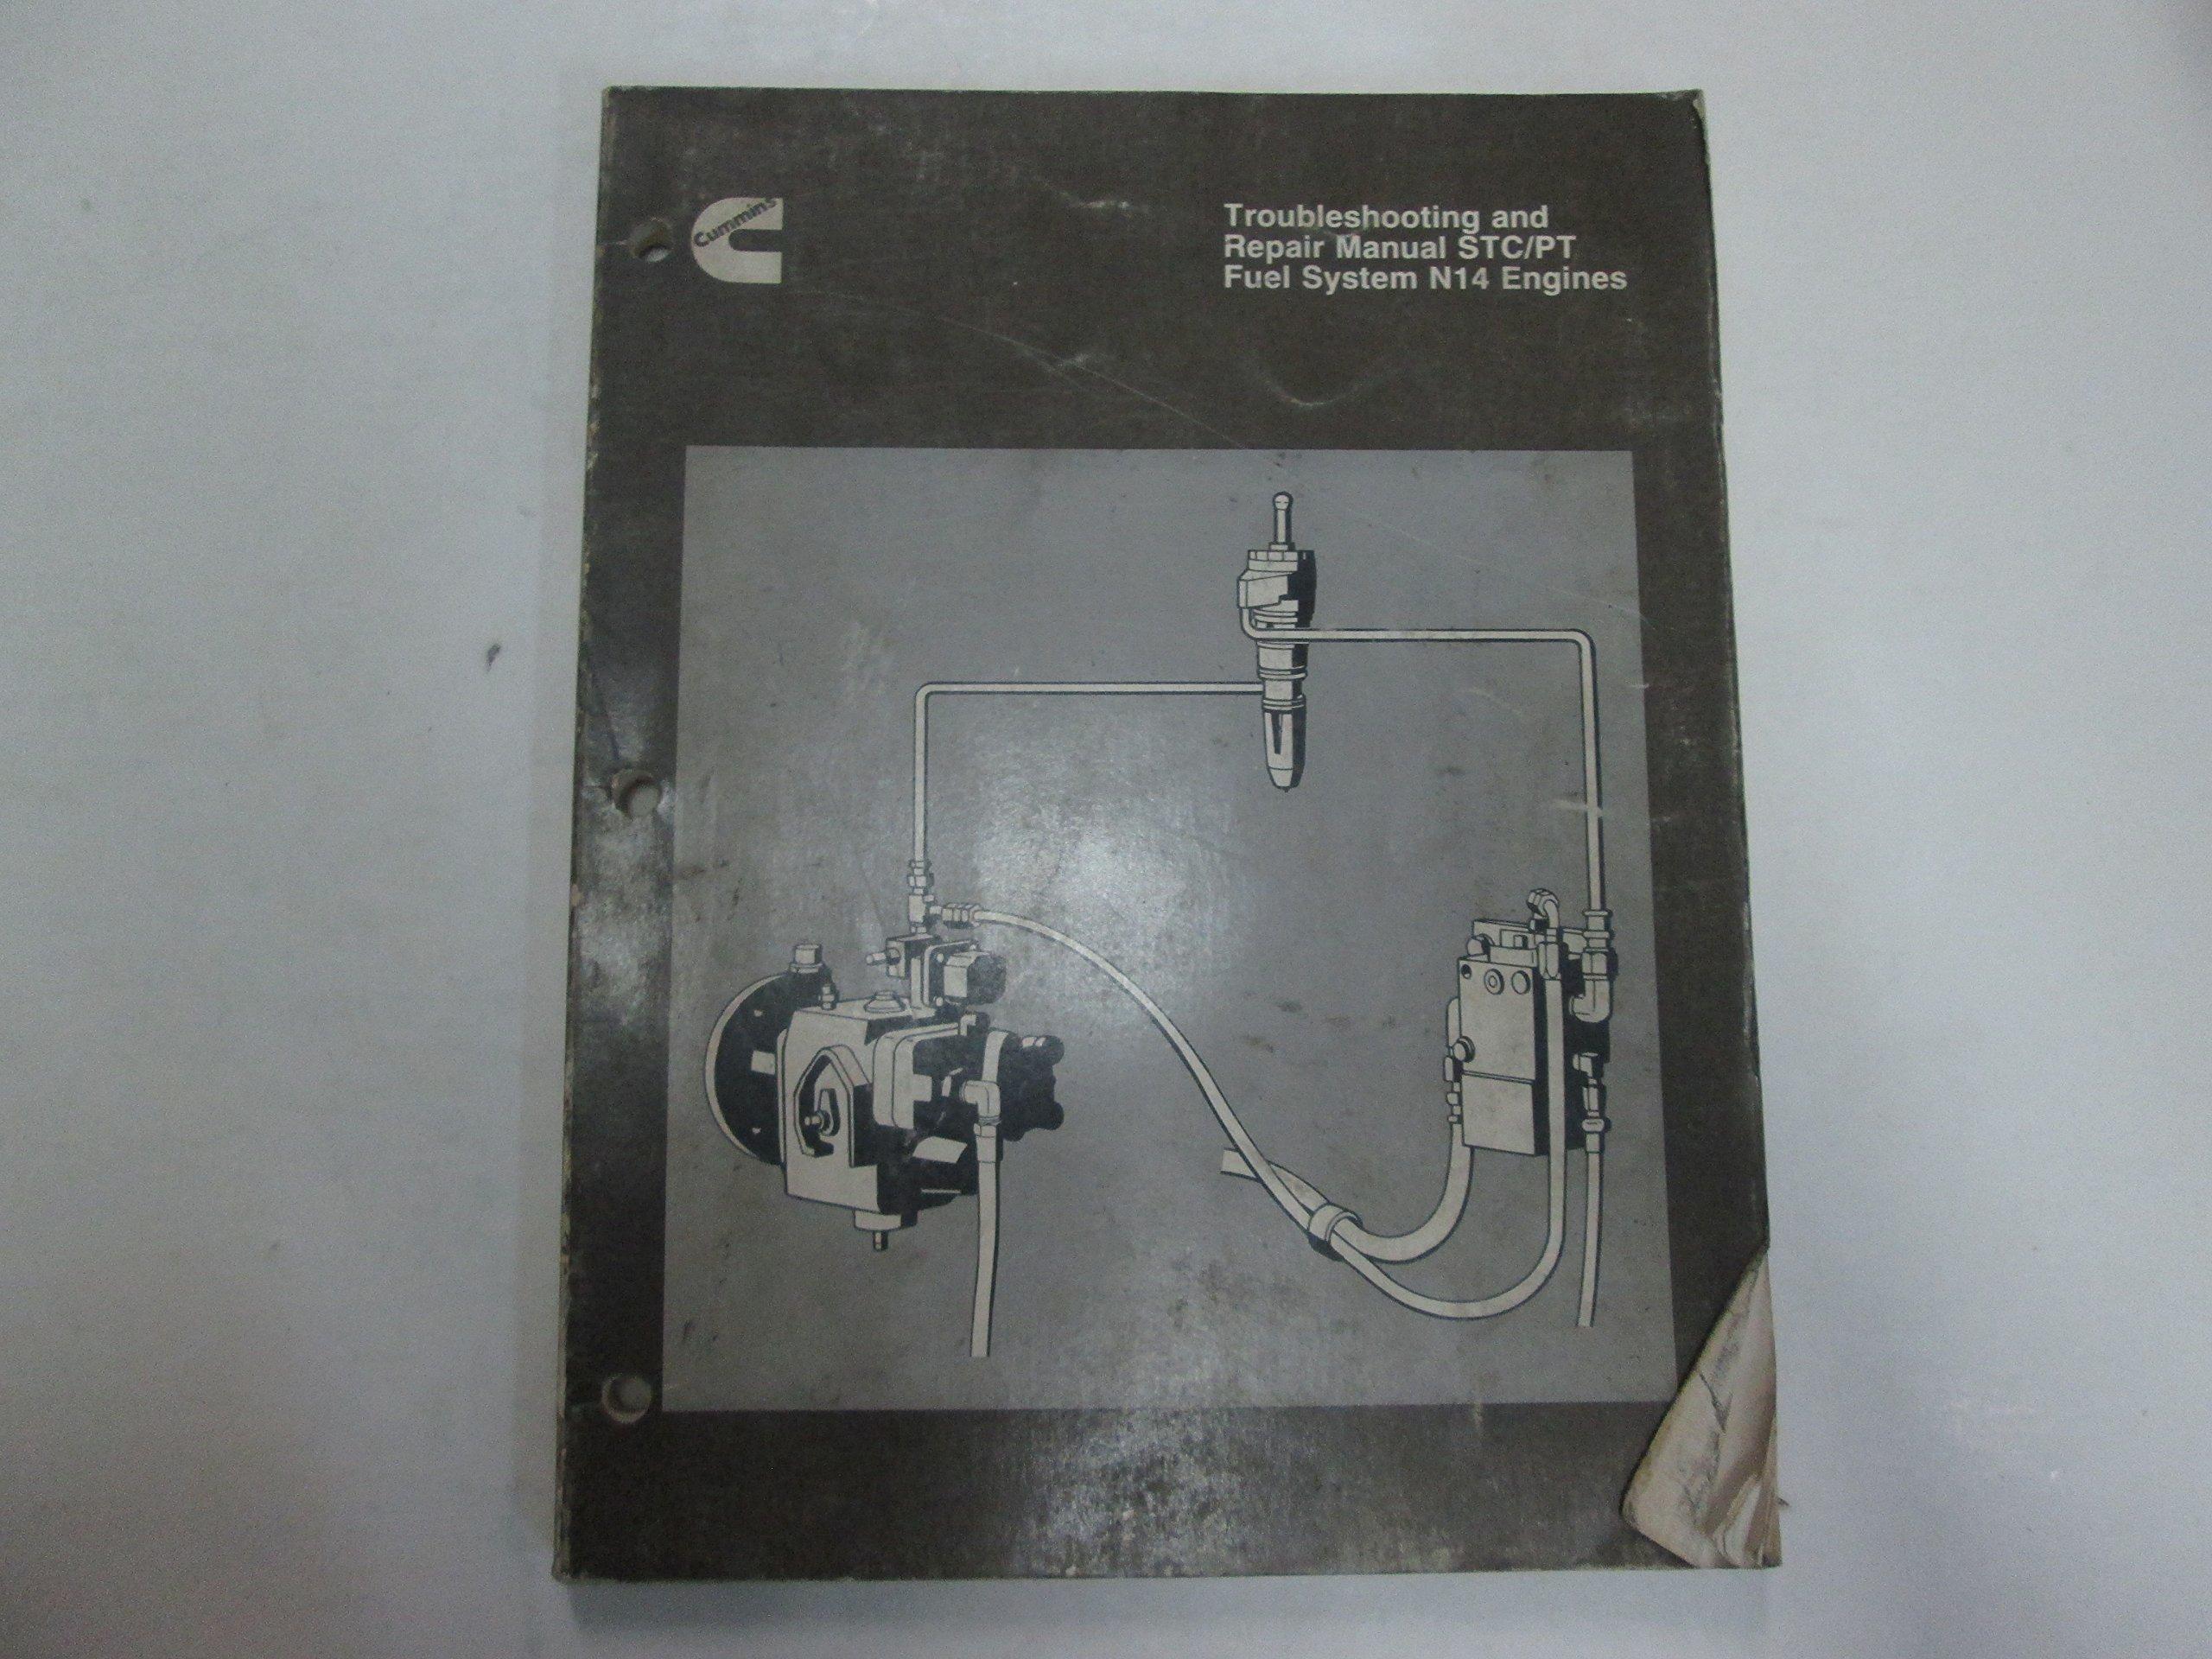 1990 Cummins Troubleshooting Repair Manual STC/PT Fuel System N14 Engines  WORN: Cummins, Cummins Diesel: Amazon.com: Books